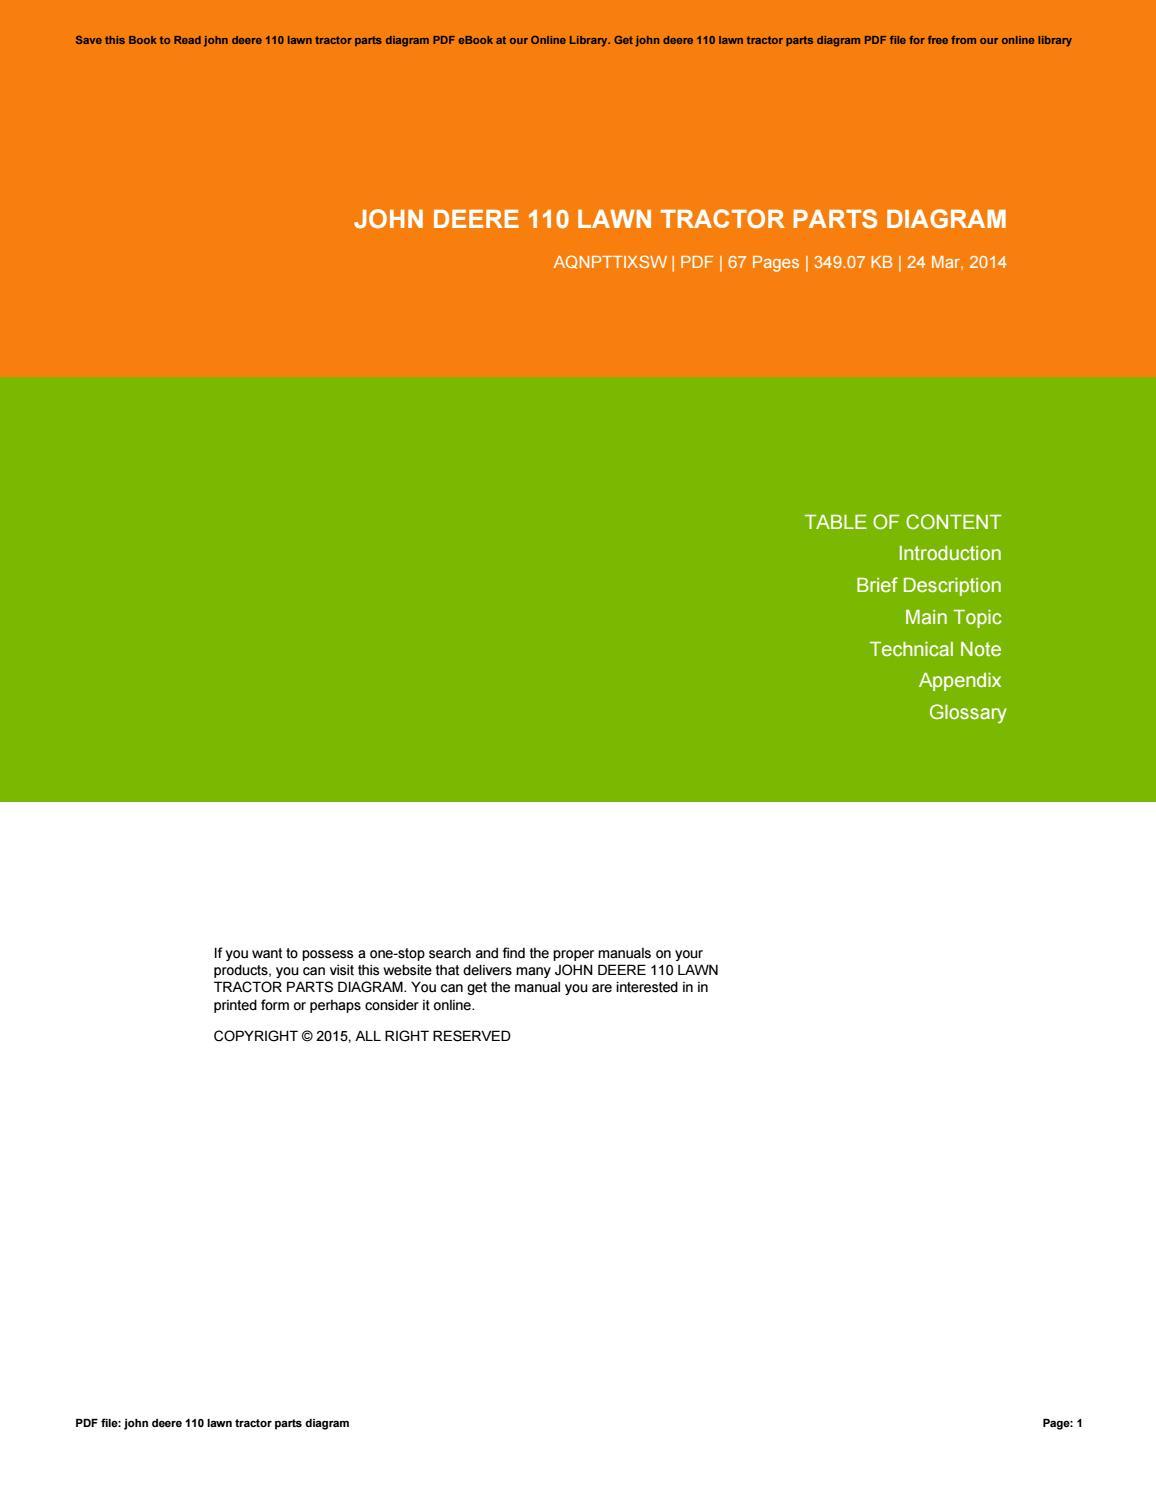 John Deere 110 Lawn Tractor Parts Diagram By